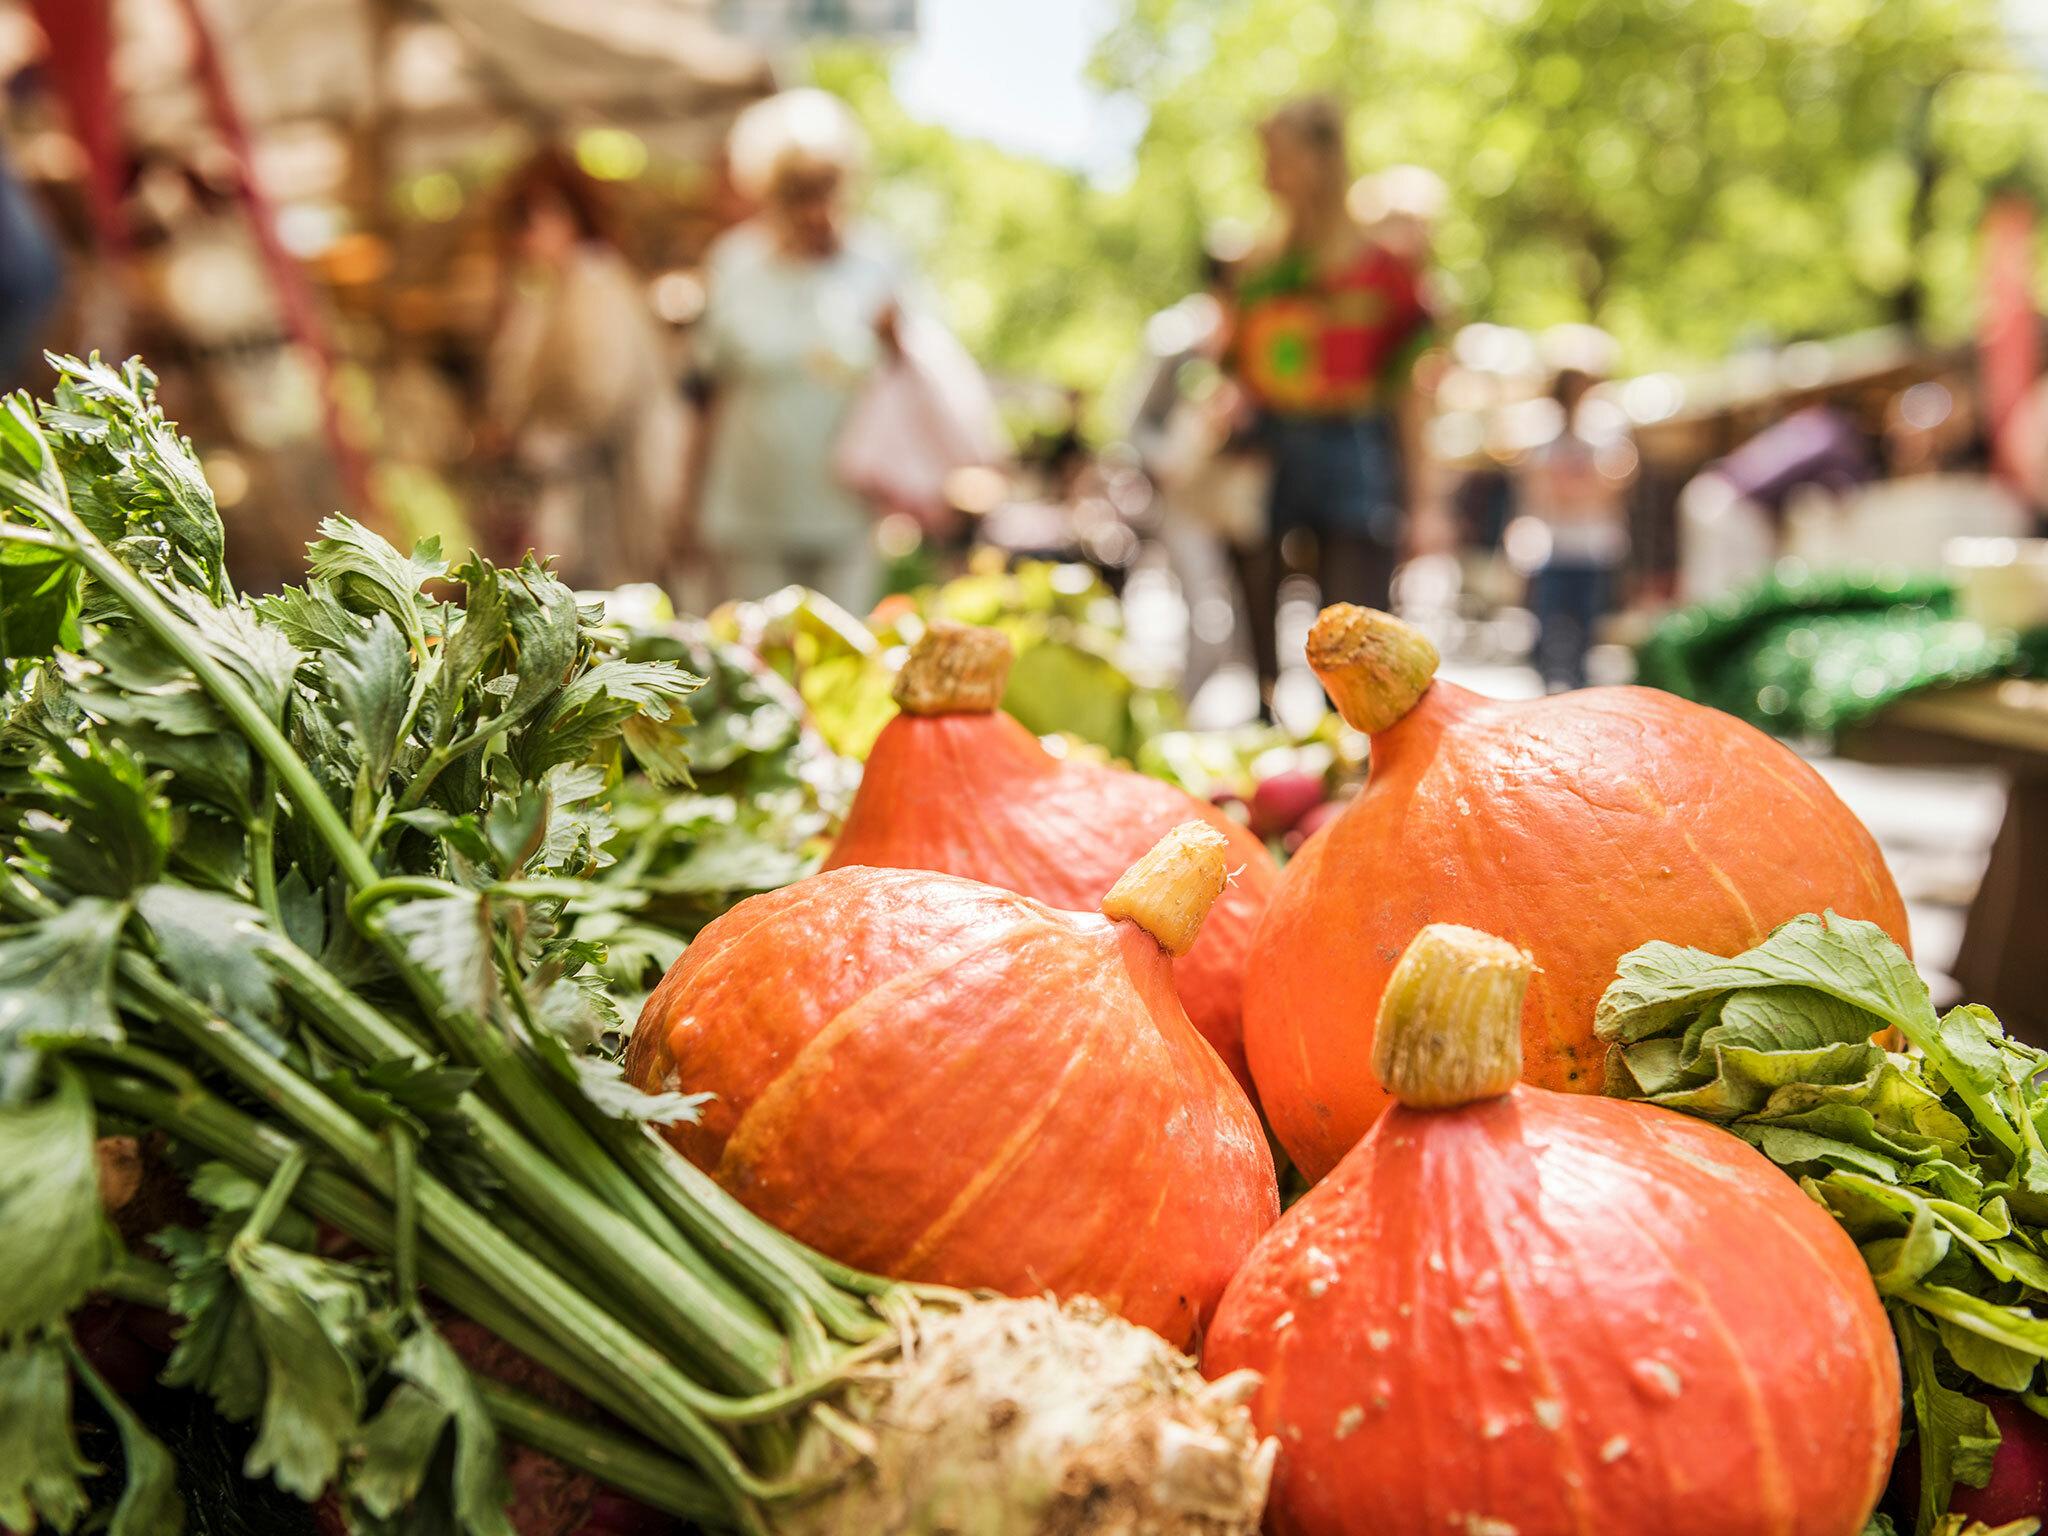 Kollwitzplatz Farmers Market